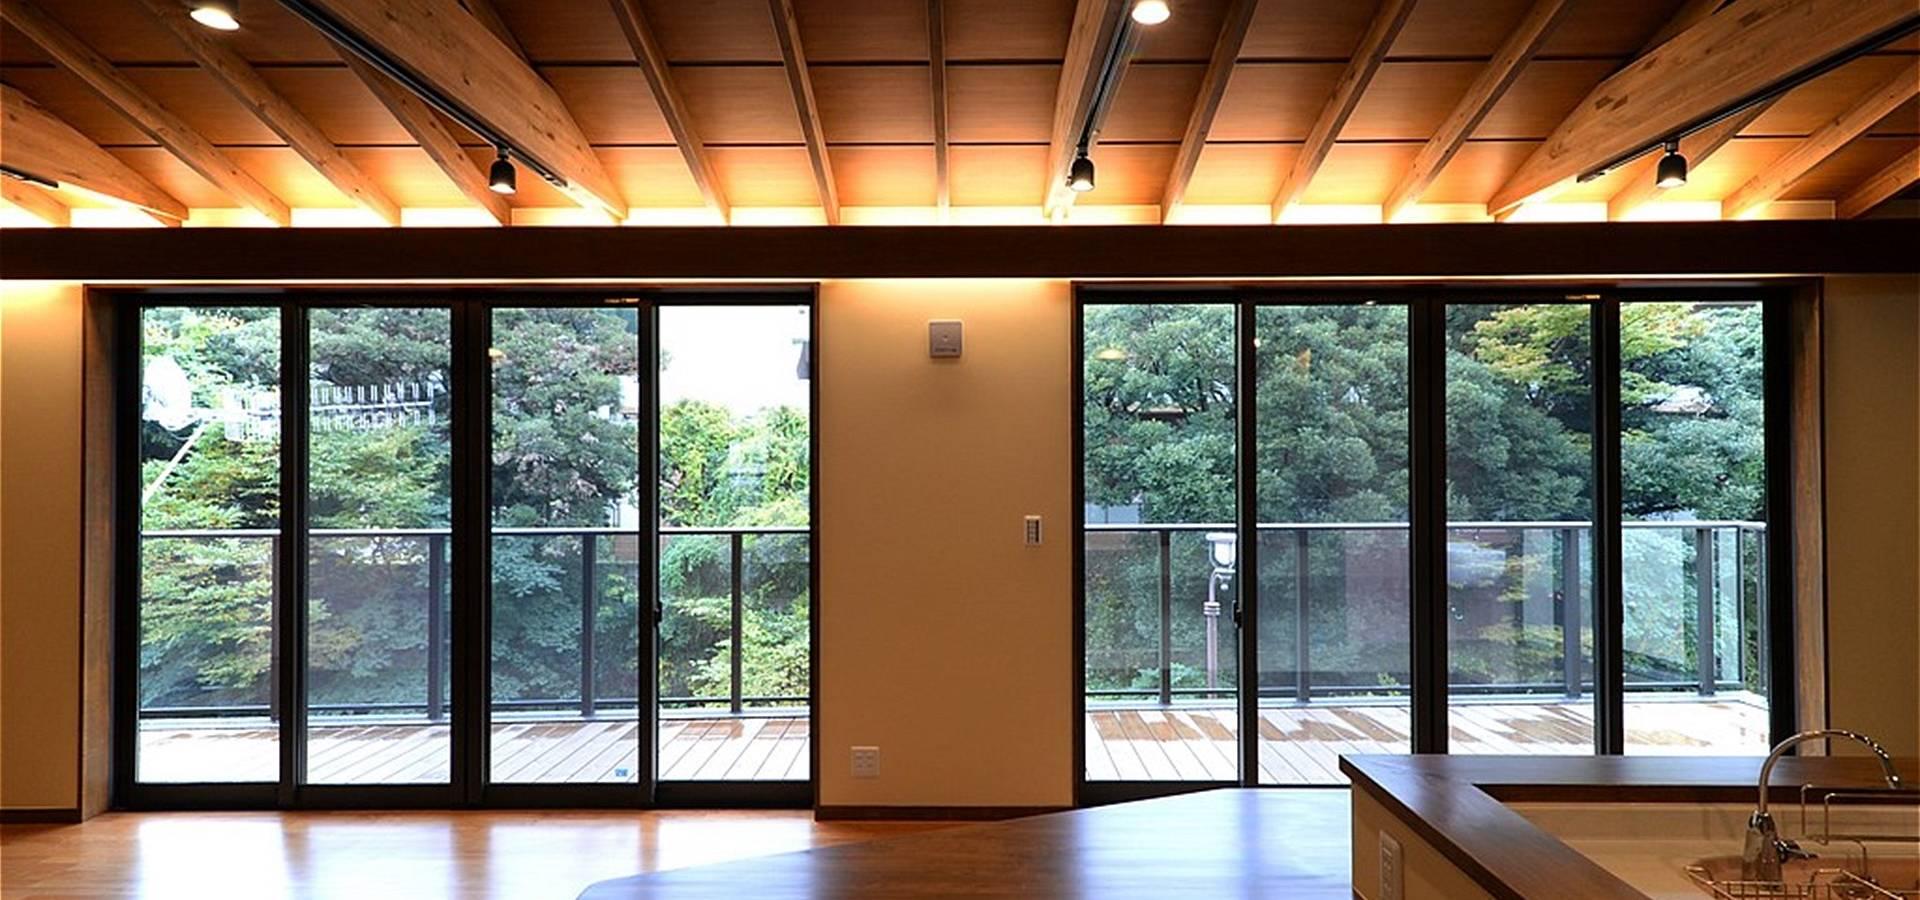 atelier shige architects /アトリエシゲ一級建築士事務所